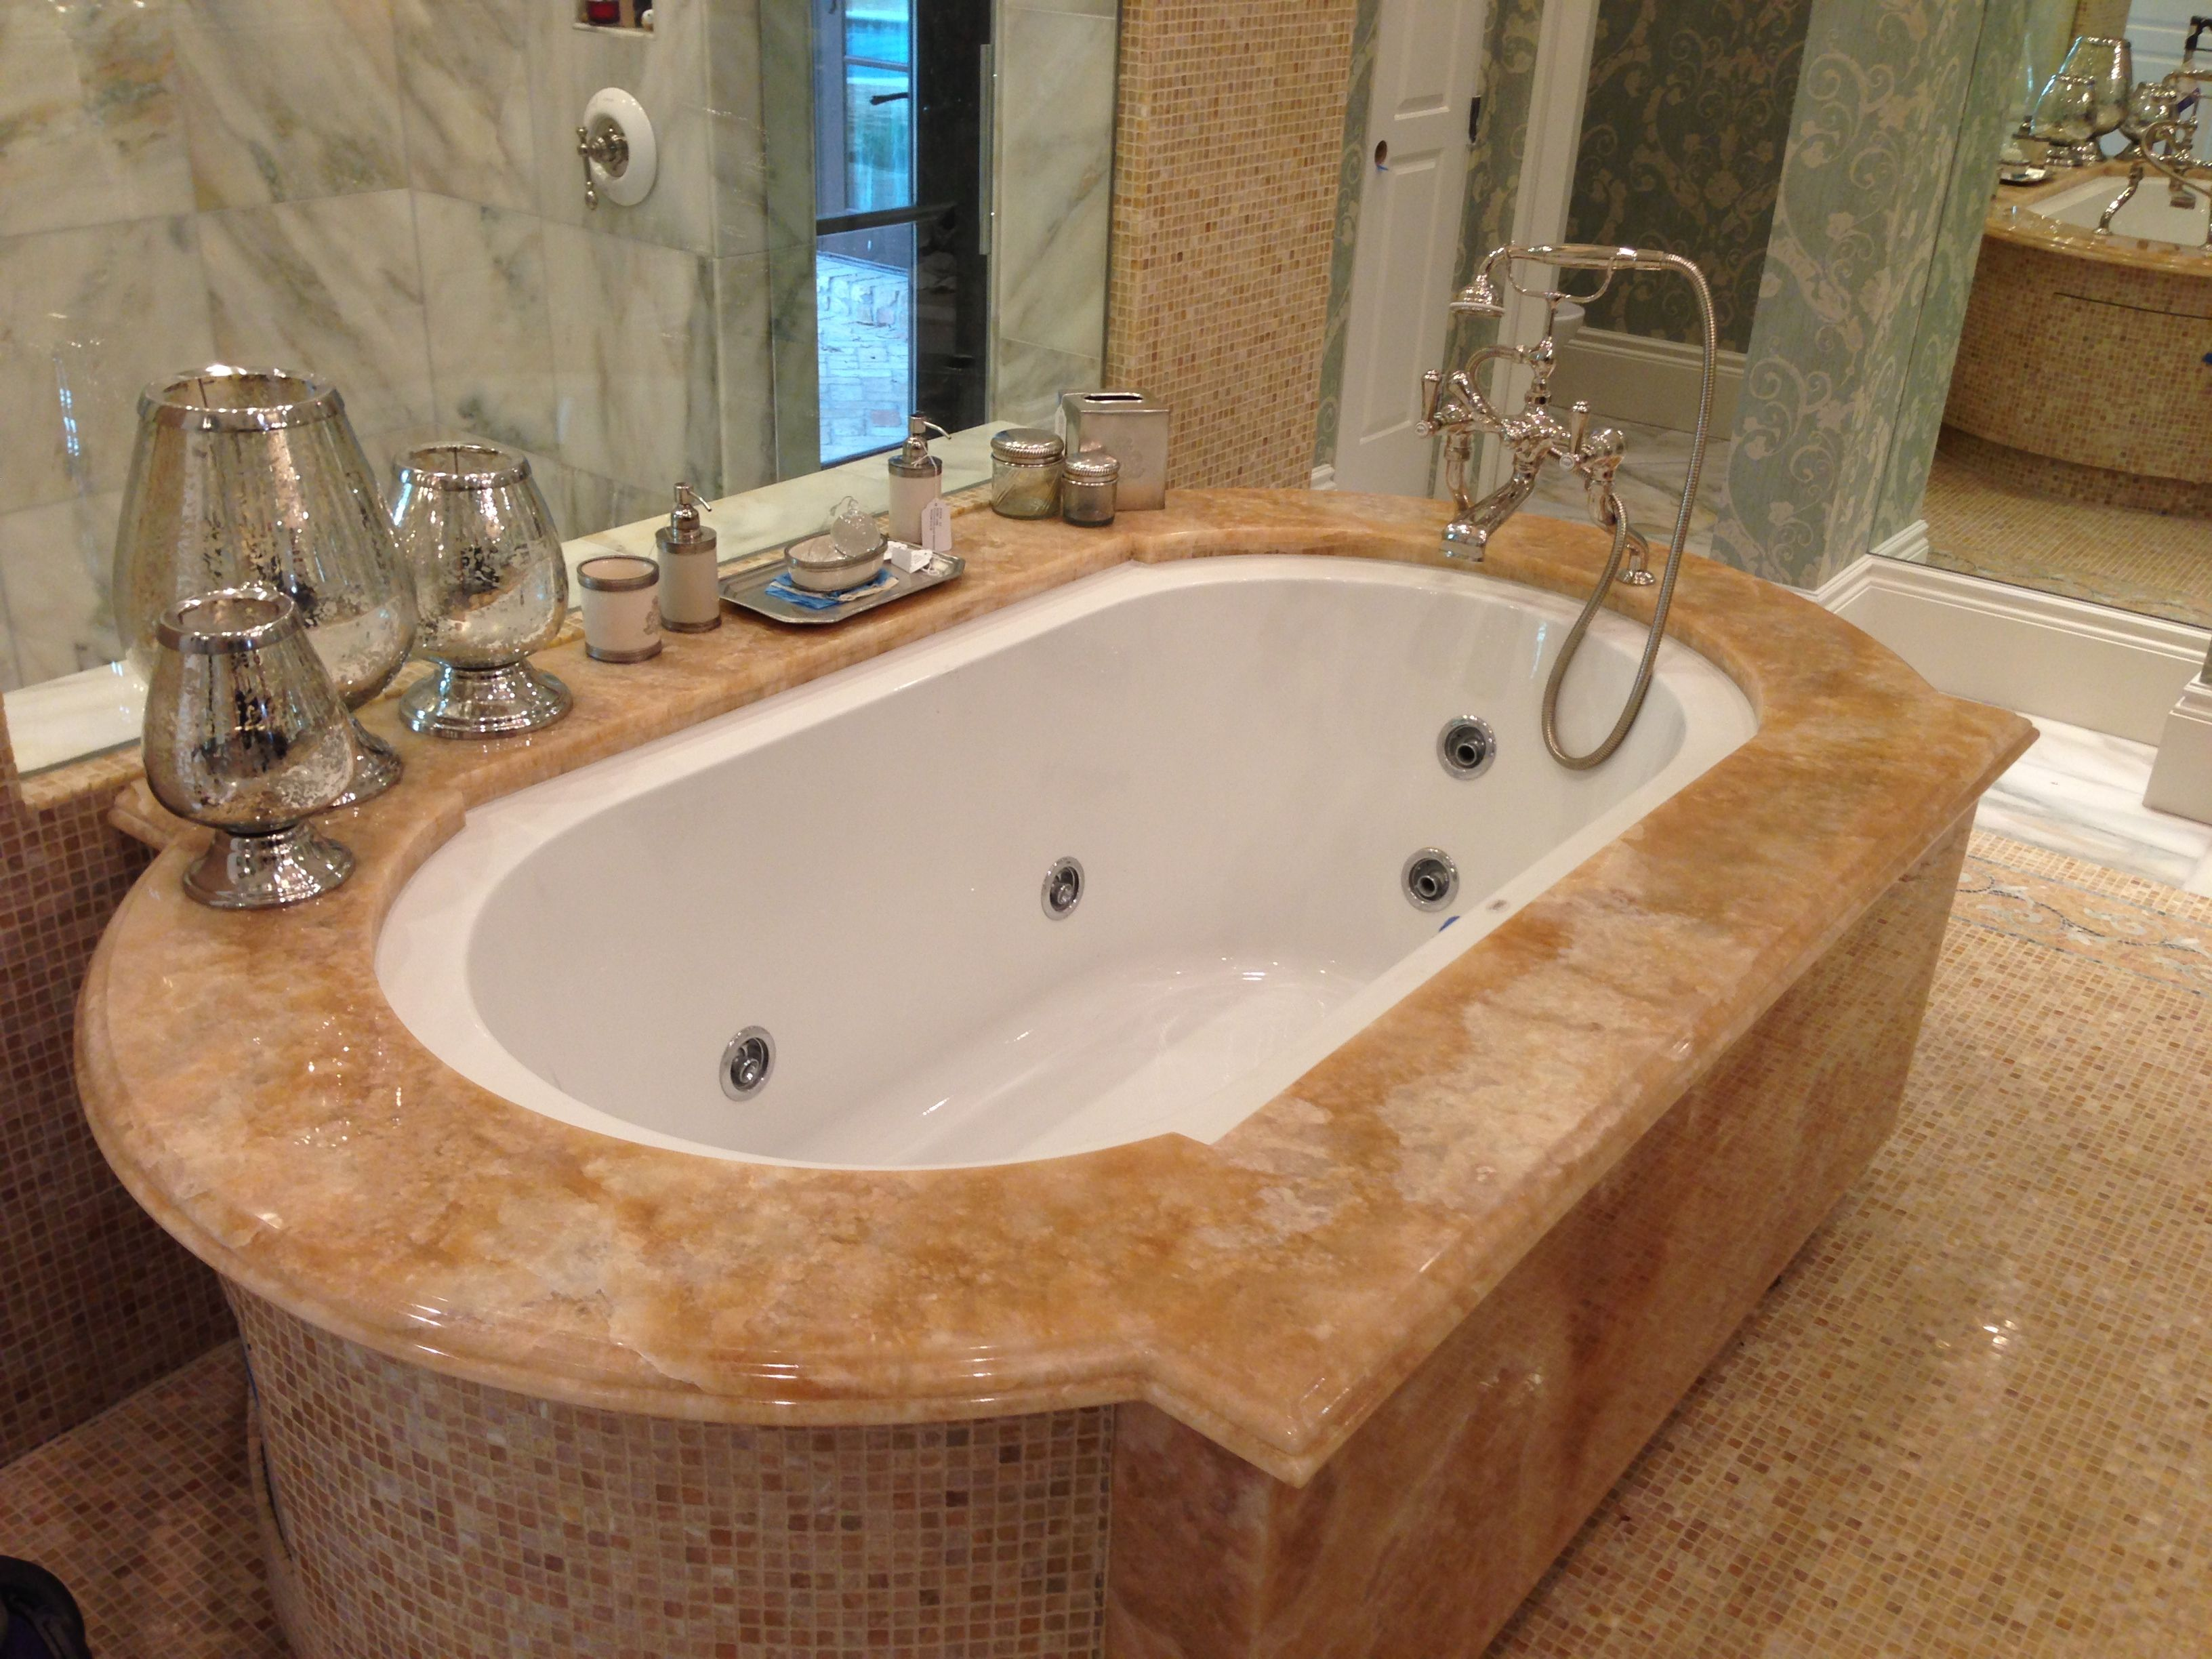 Beautiful Brown / Tan / White Granite Bathtub | ADP Surfaces Of Orlando, Florida |  ADPSurfaces